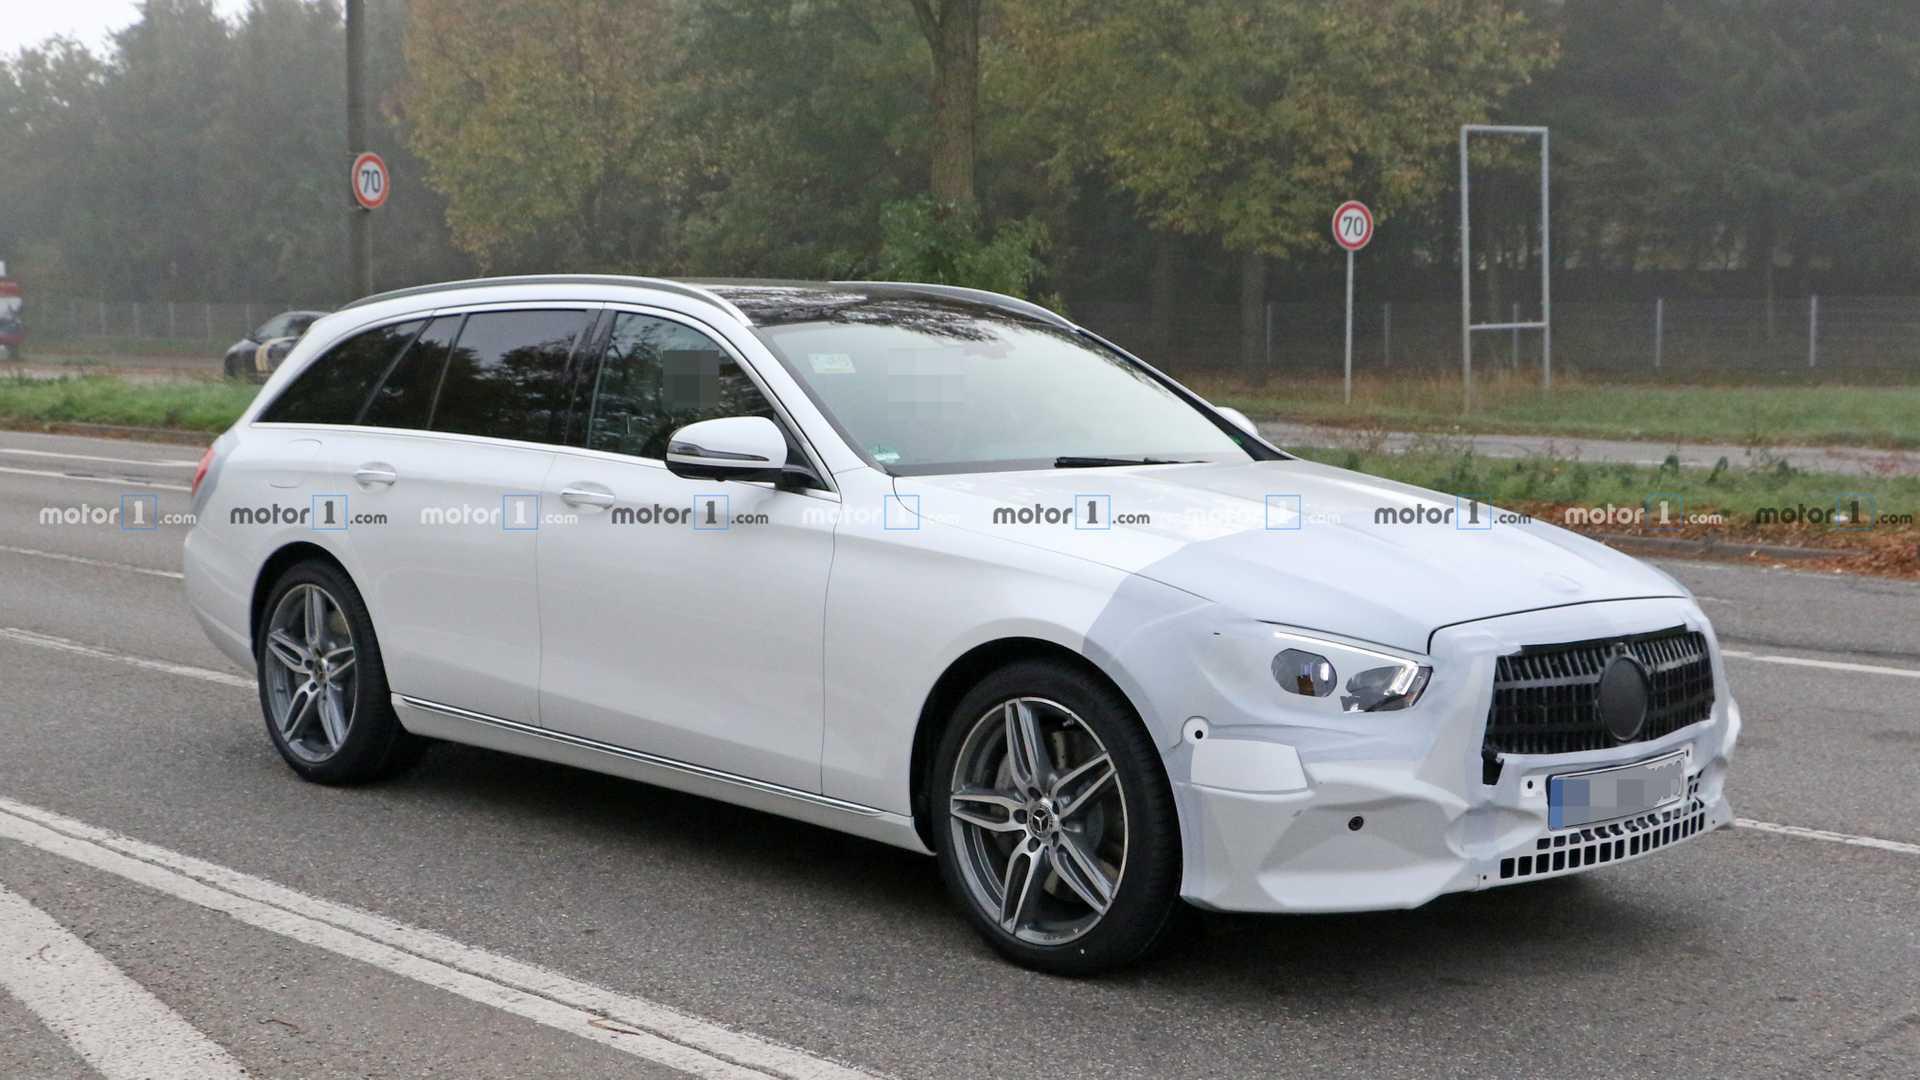 96 Great Spy Shots 2020 Mercedes E Class Performance and New Engine by Spy Shots 2020 Mercedes E Class